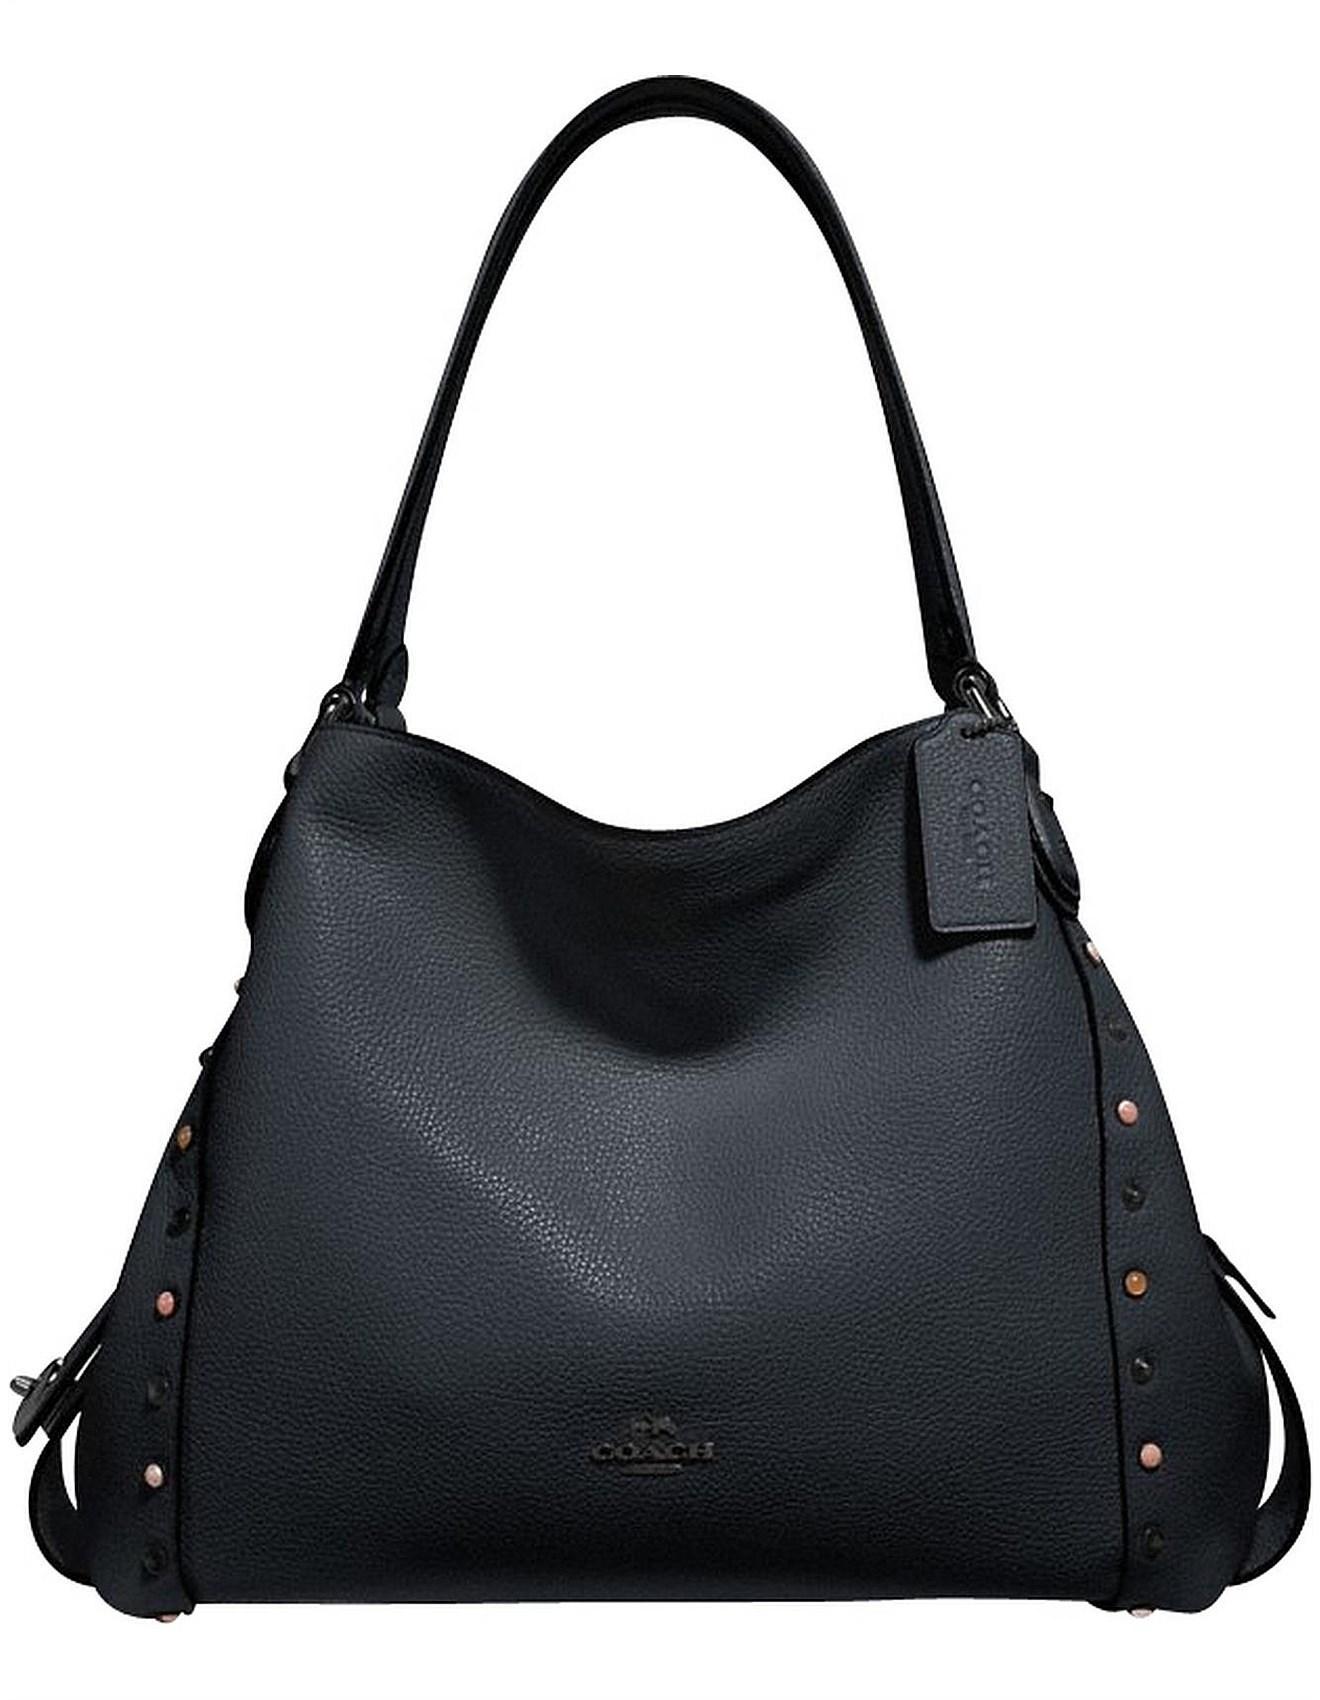 328255fbd5195 COACH Edie Shoulder Bag 31 With Rivets - Lyst